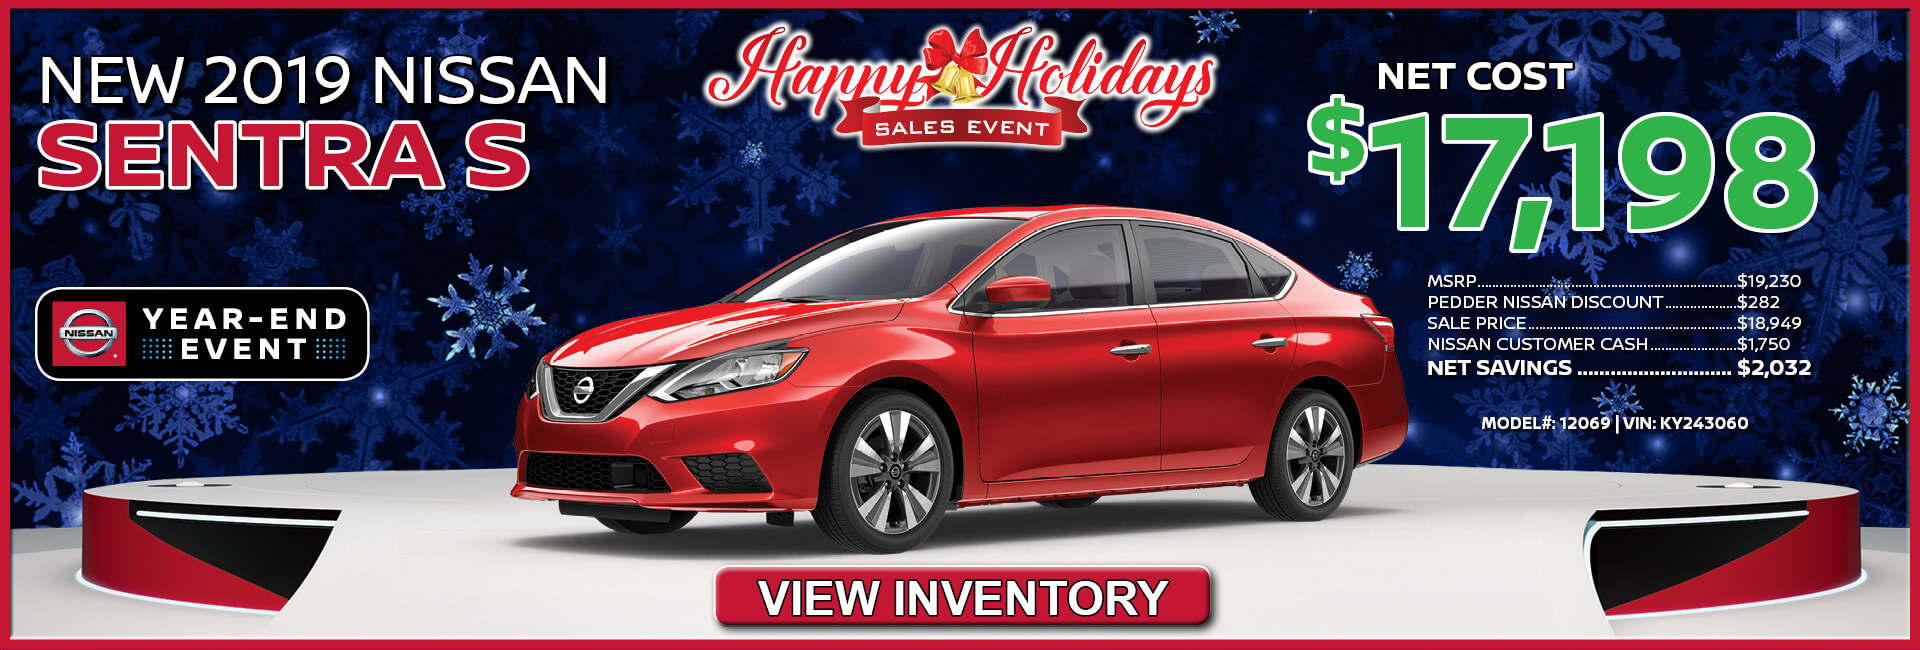 Nissan Sentra $17,198